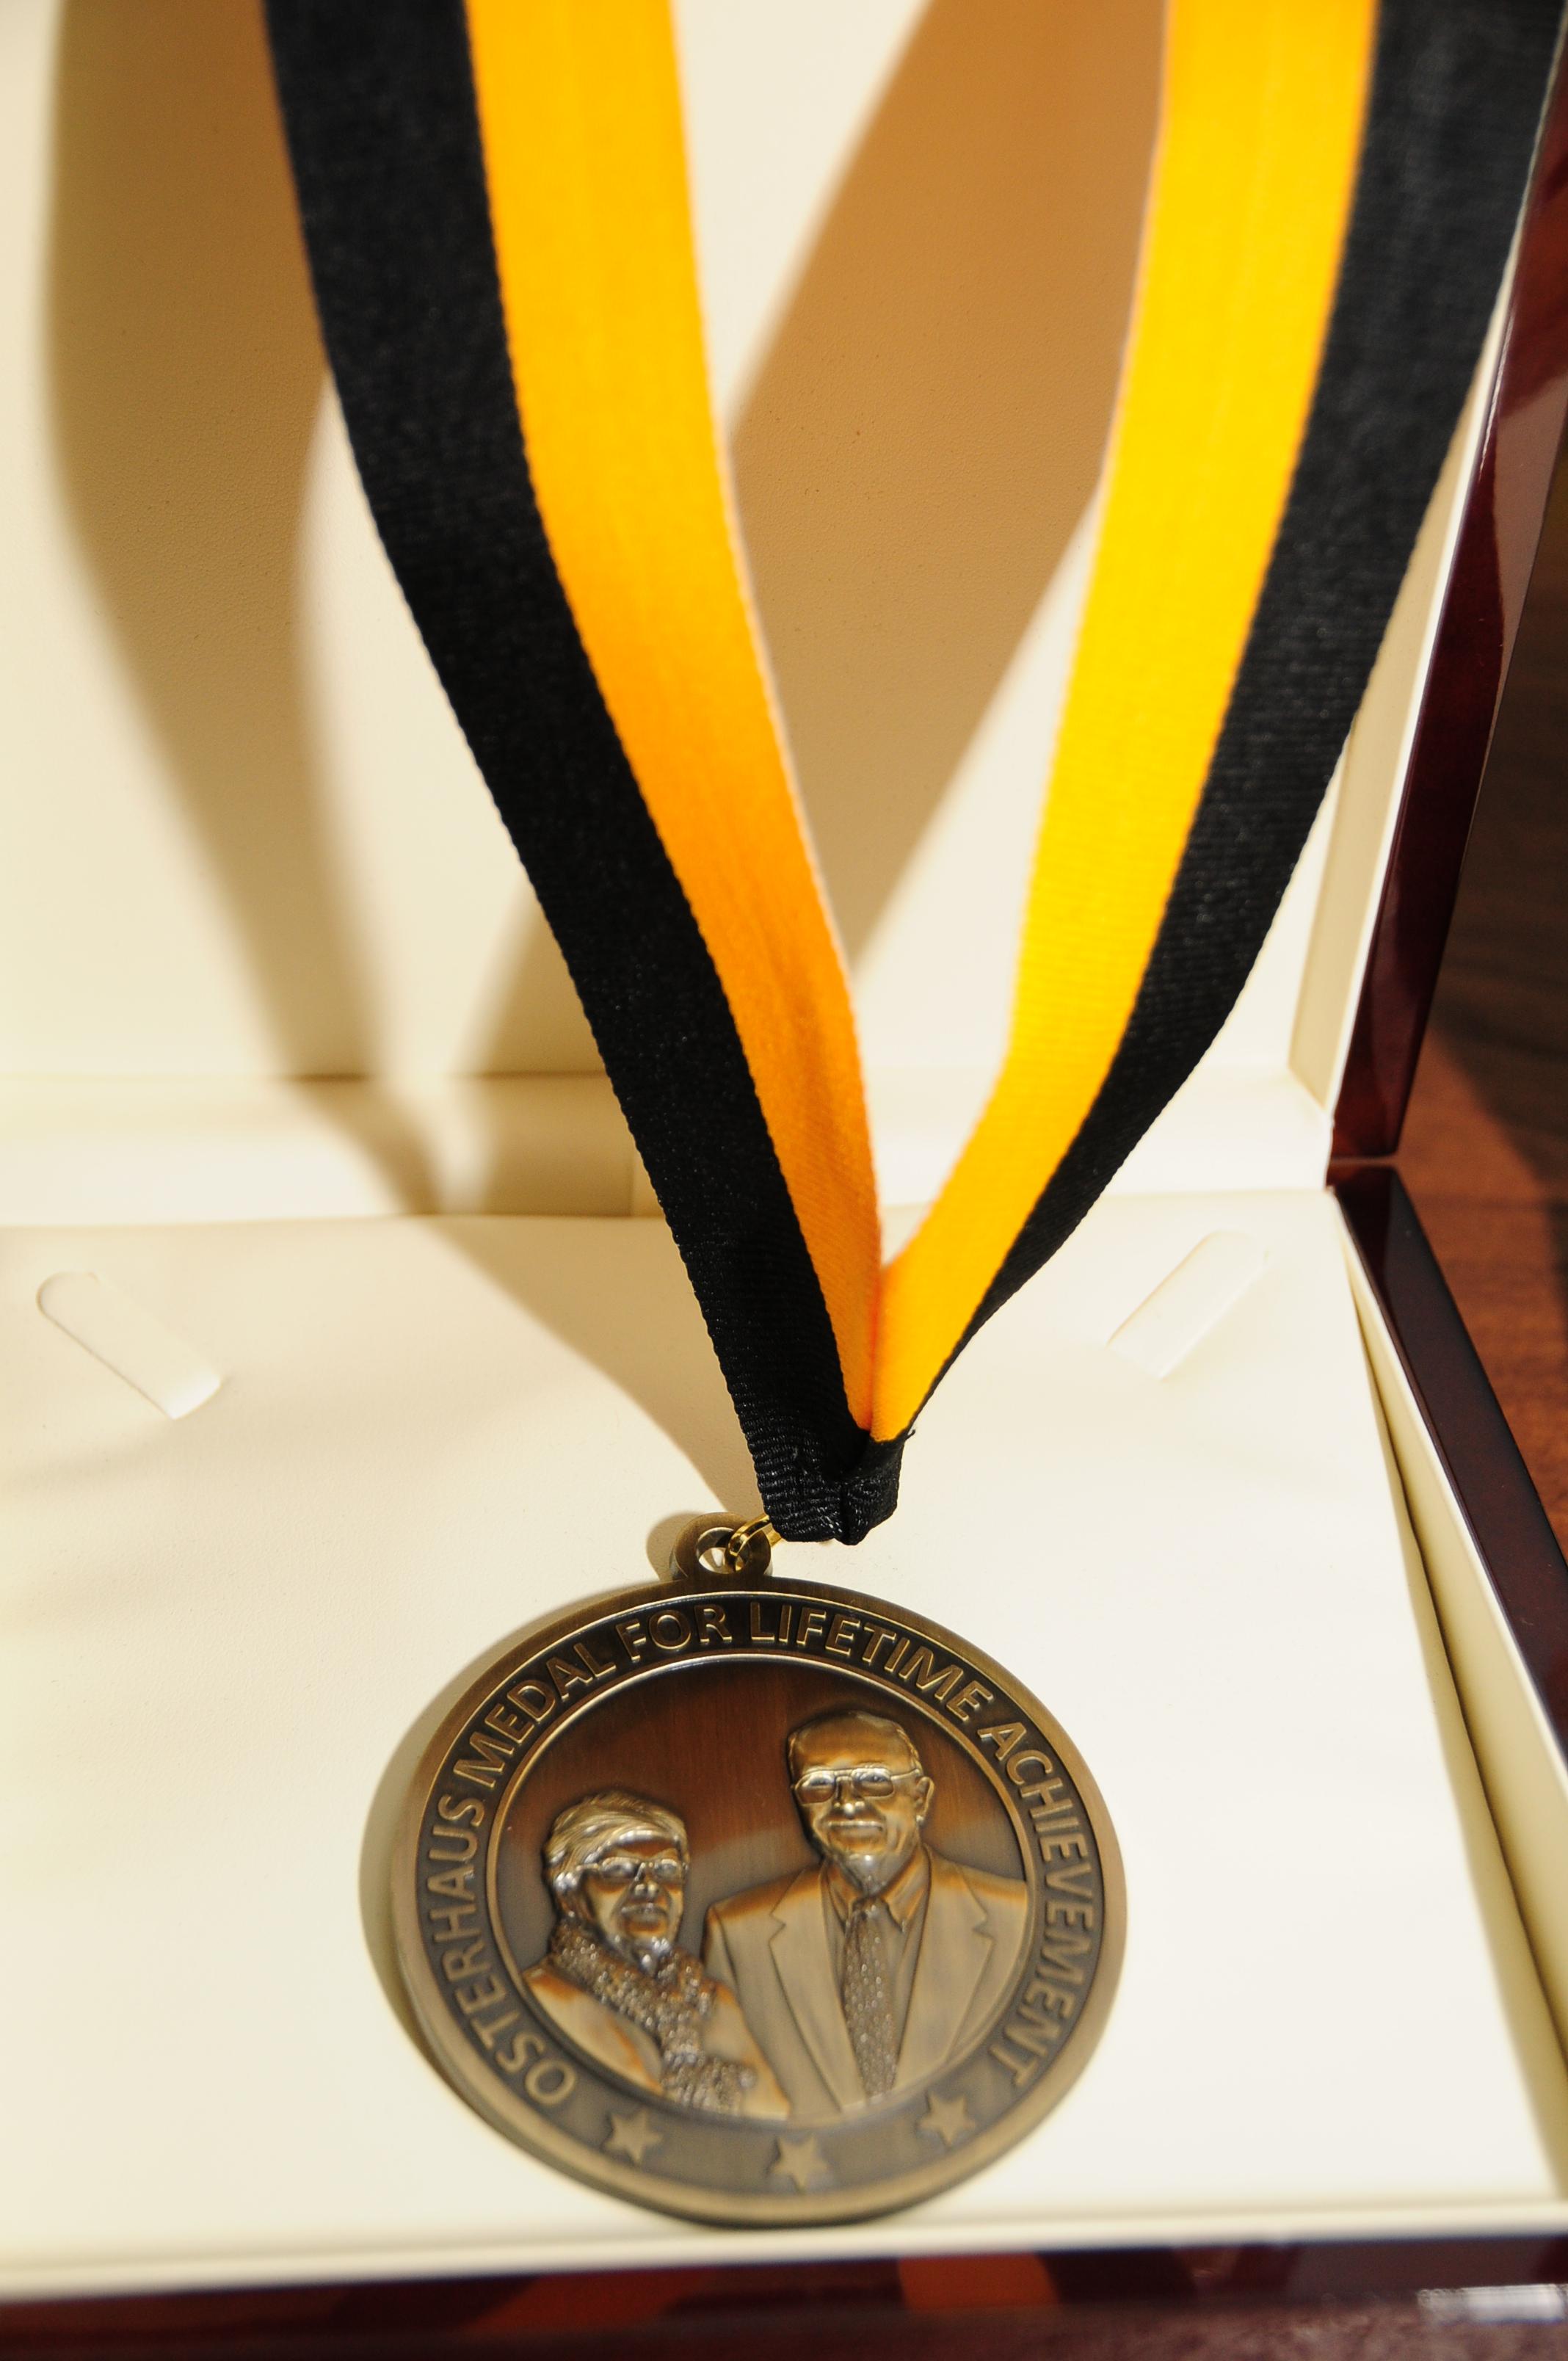 Osterhaus Medal for Lifetime Achievement 2018